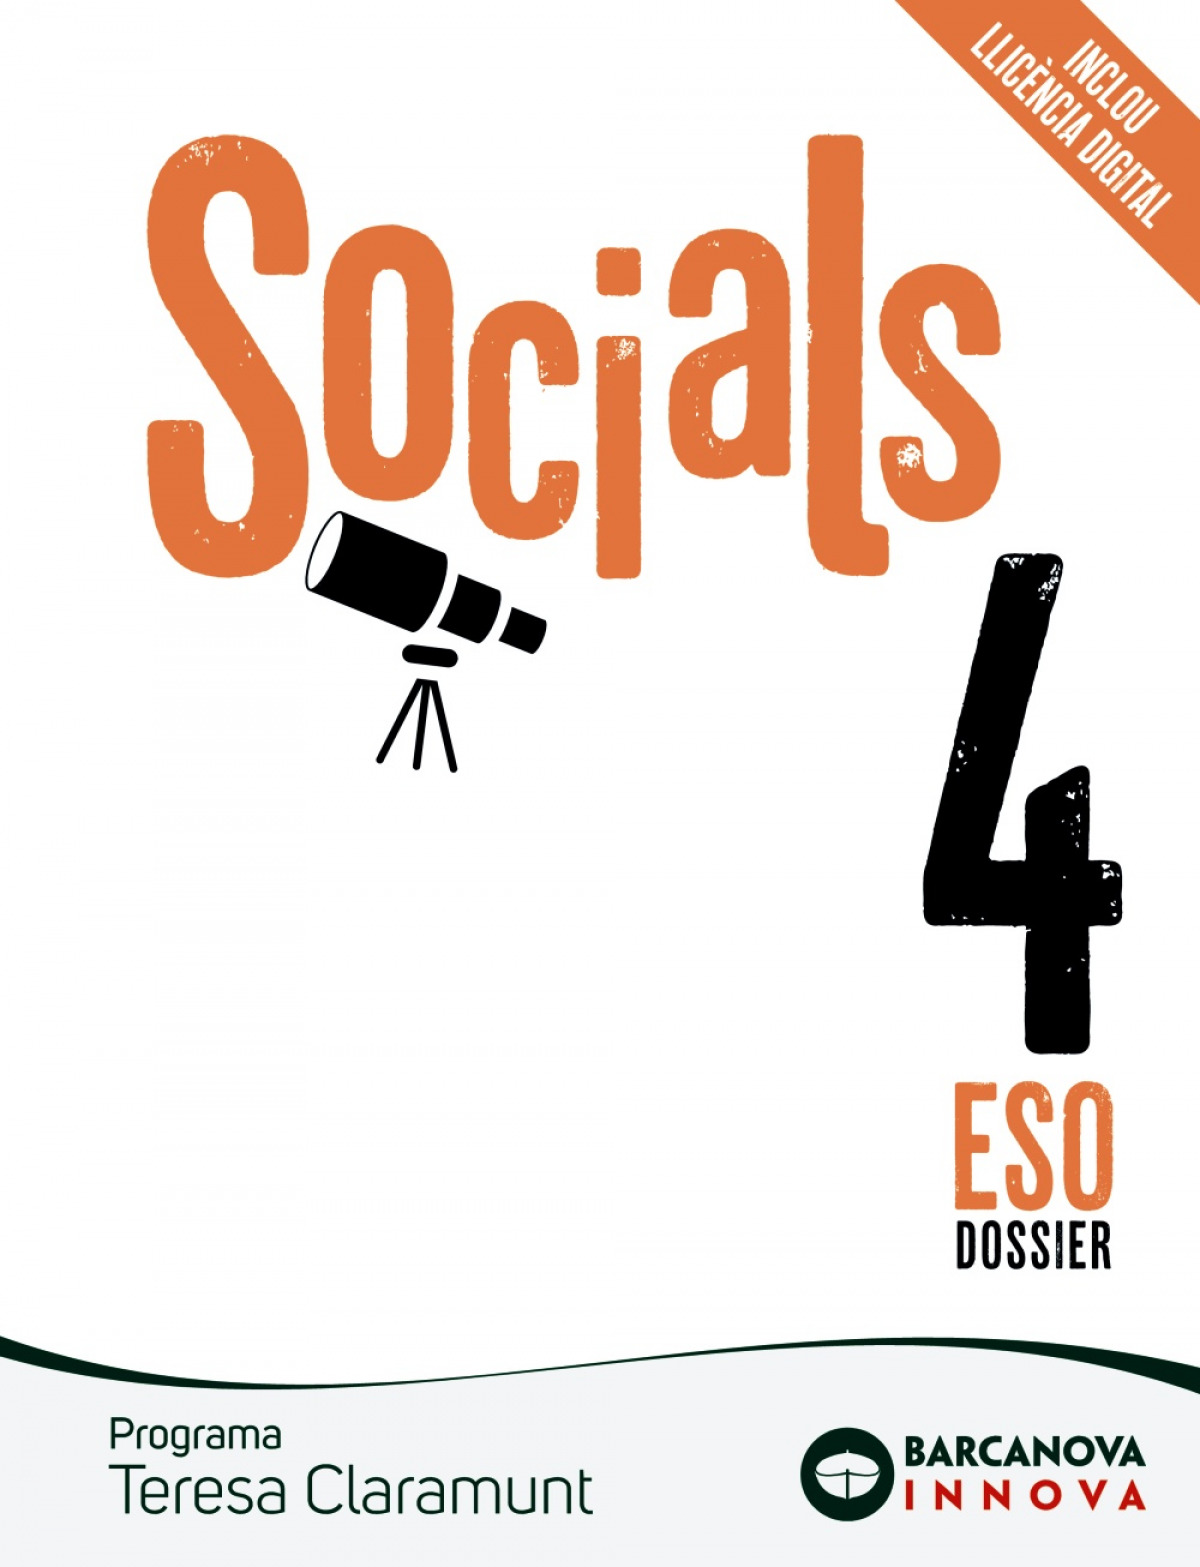 Teresa Claramunt 4 ESO. Socials